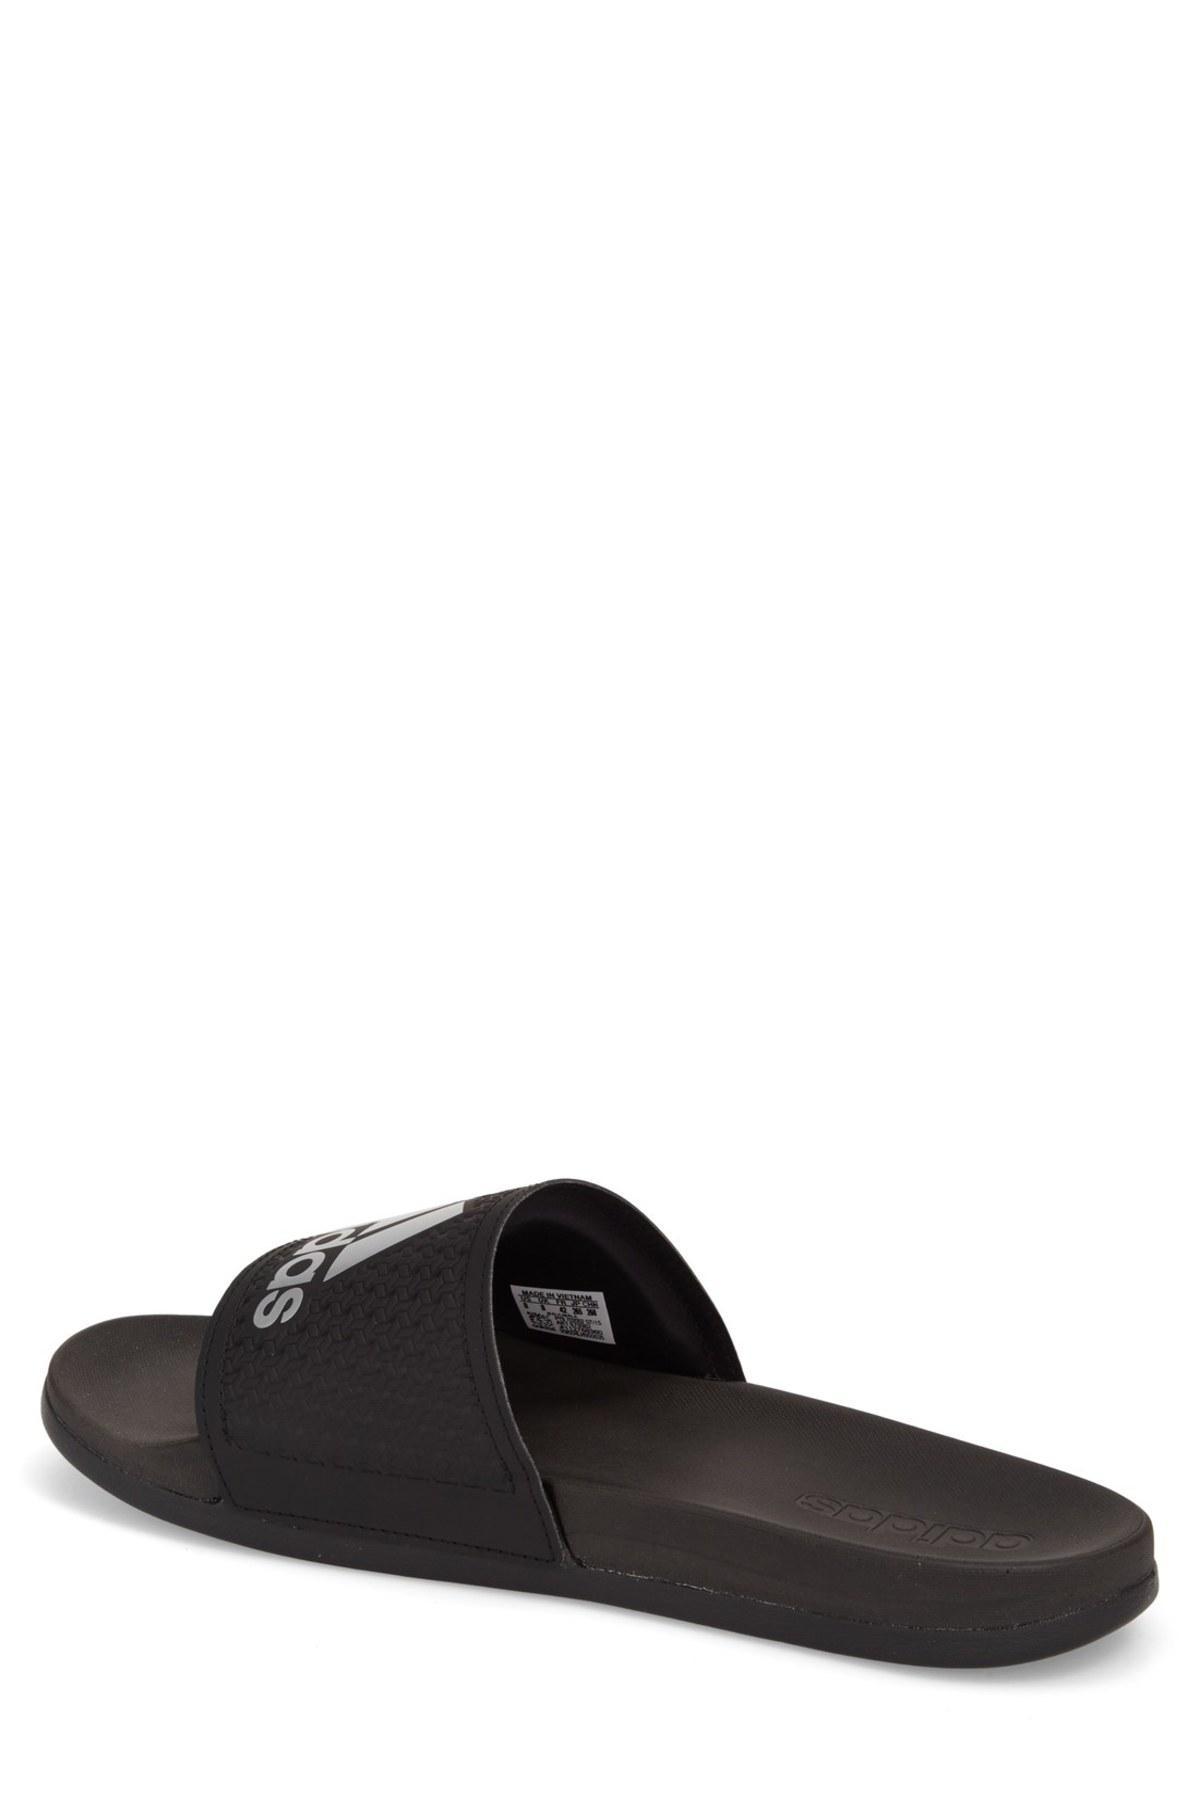 033b955044826 Lyst - adidas Adilette Supercloud Slide Sandal (men s) in Black for Men